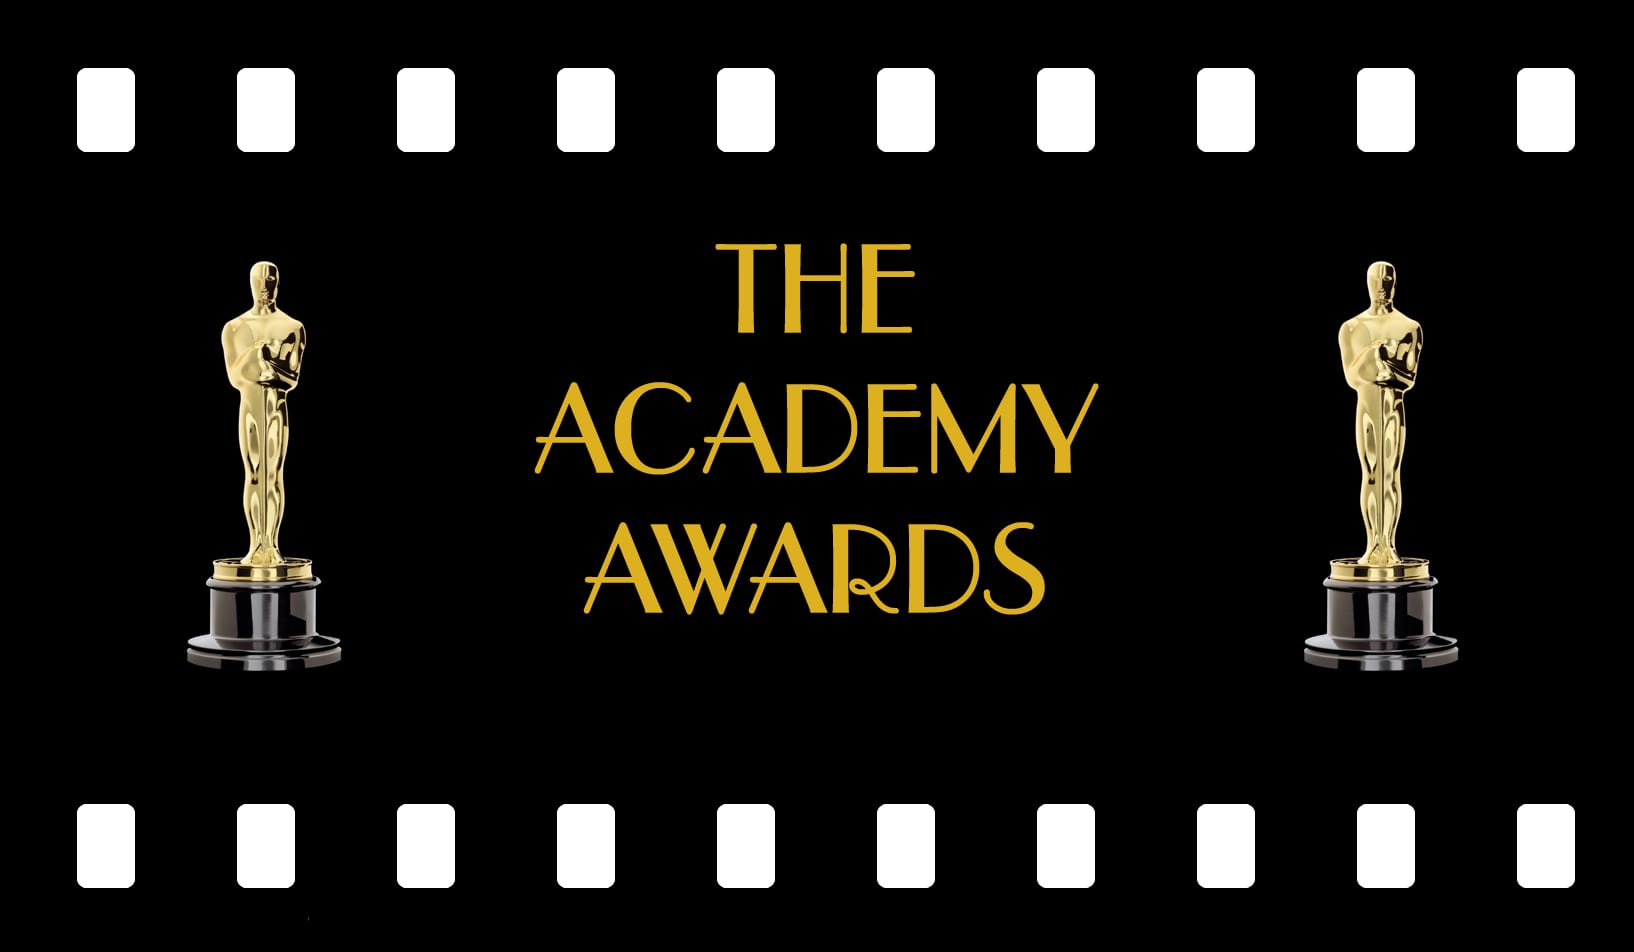 academy-awards-filmstrip-logo.jpg